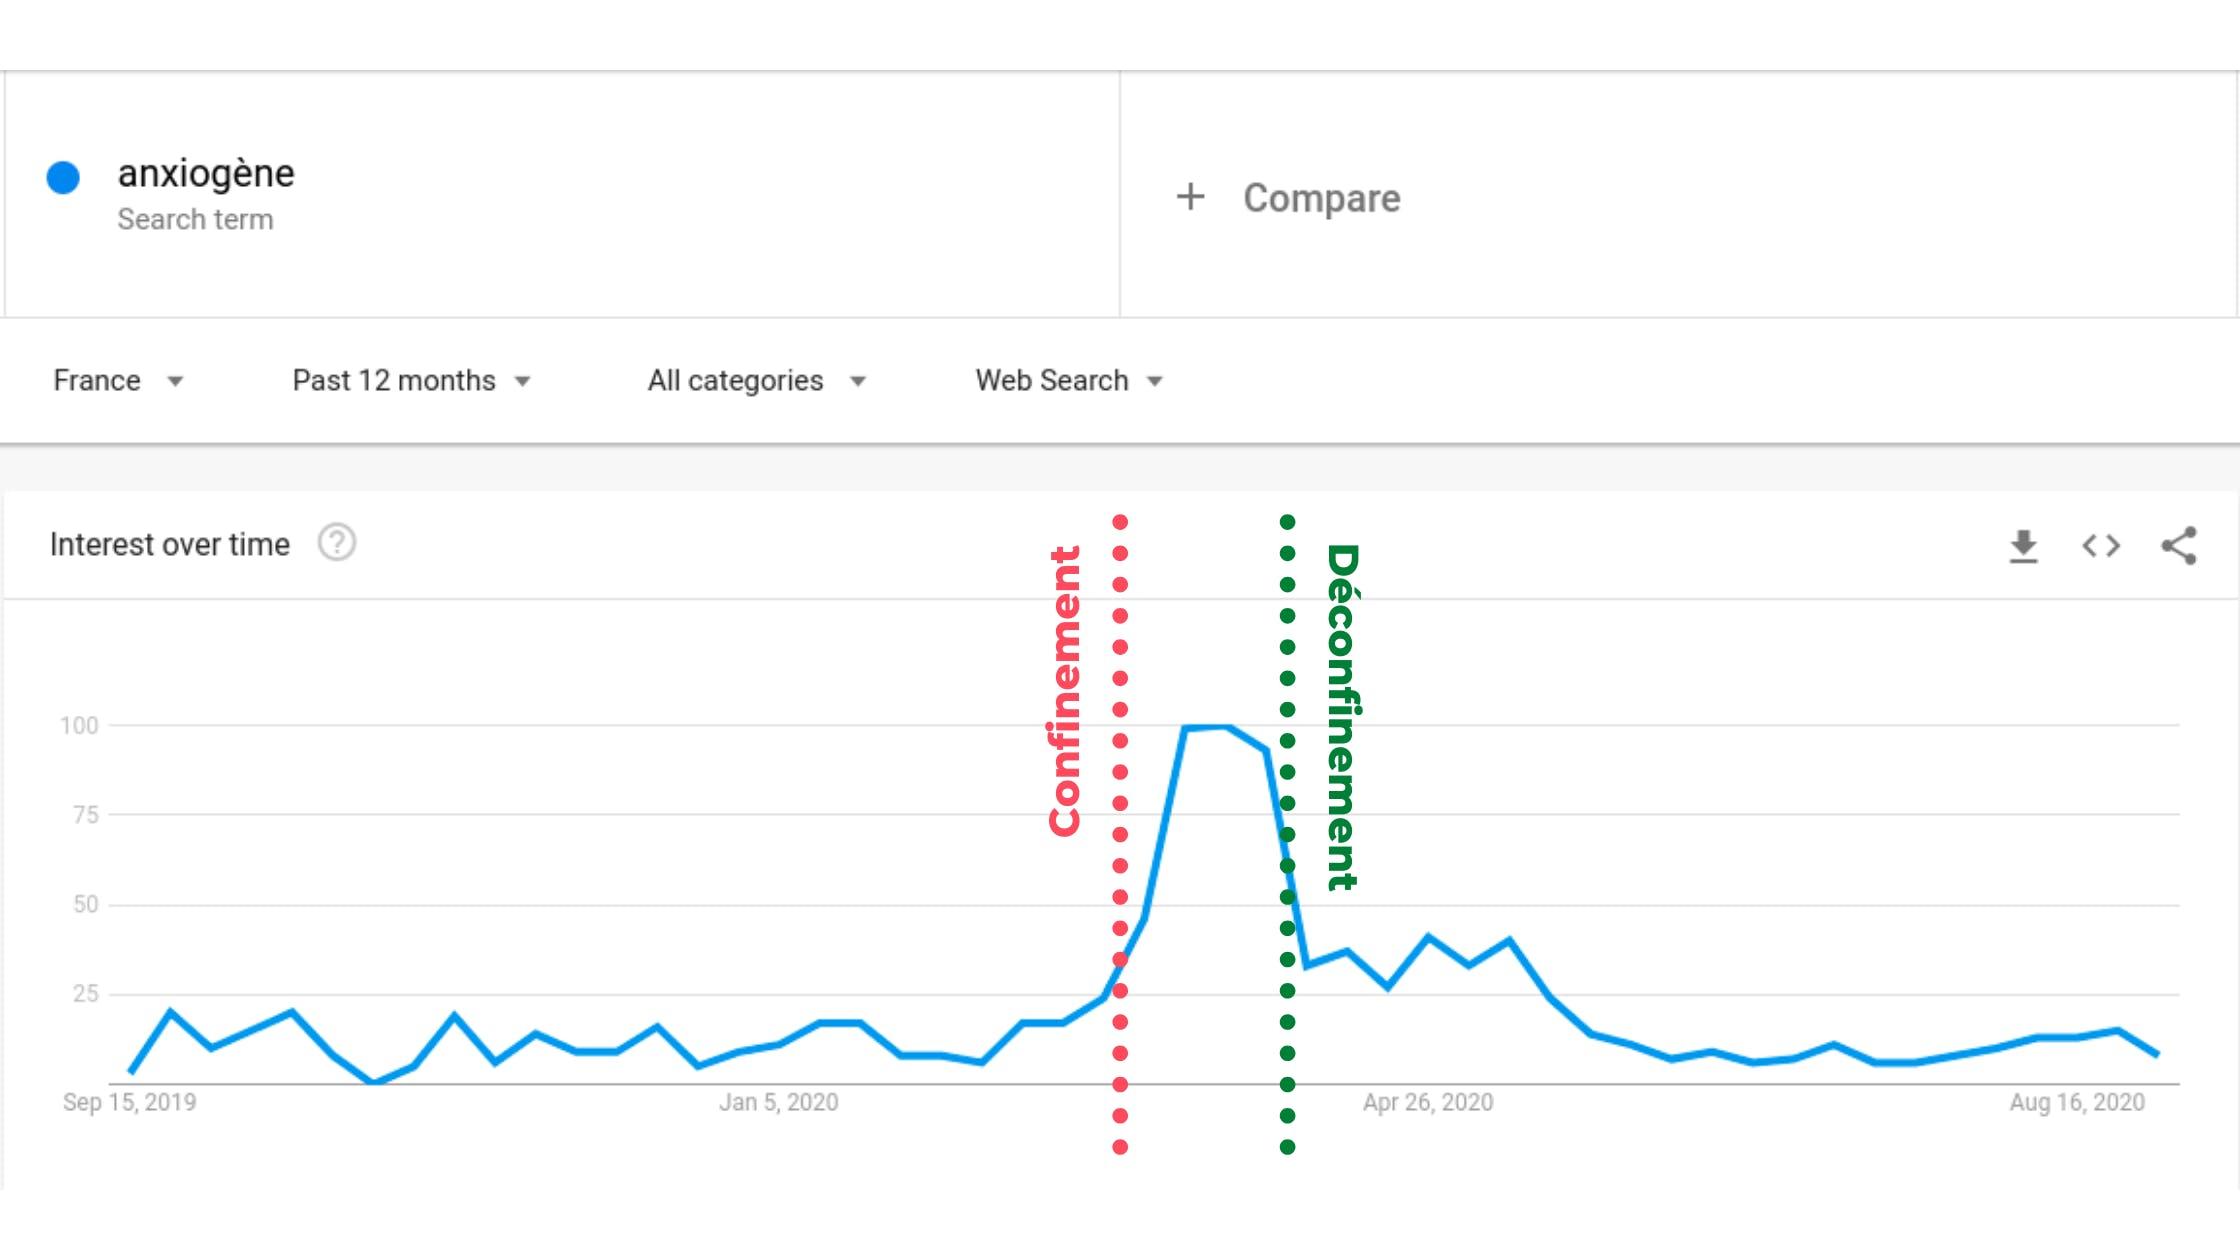 angiogène graph over time